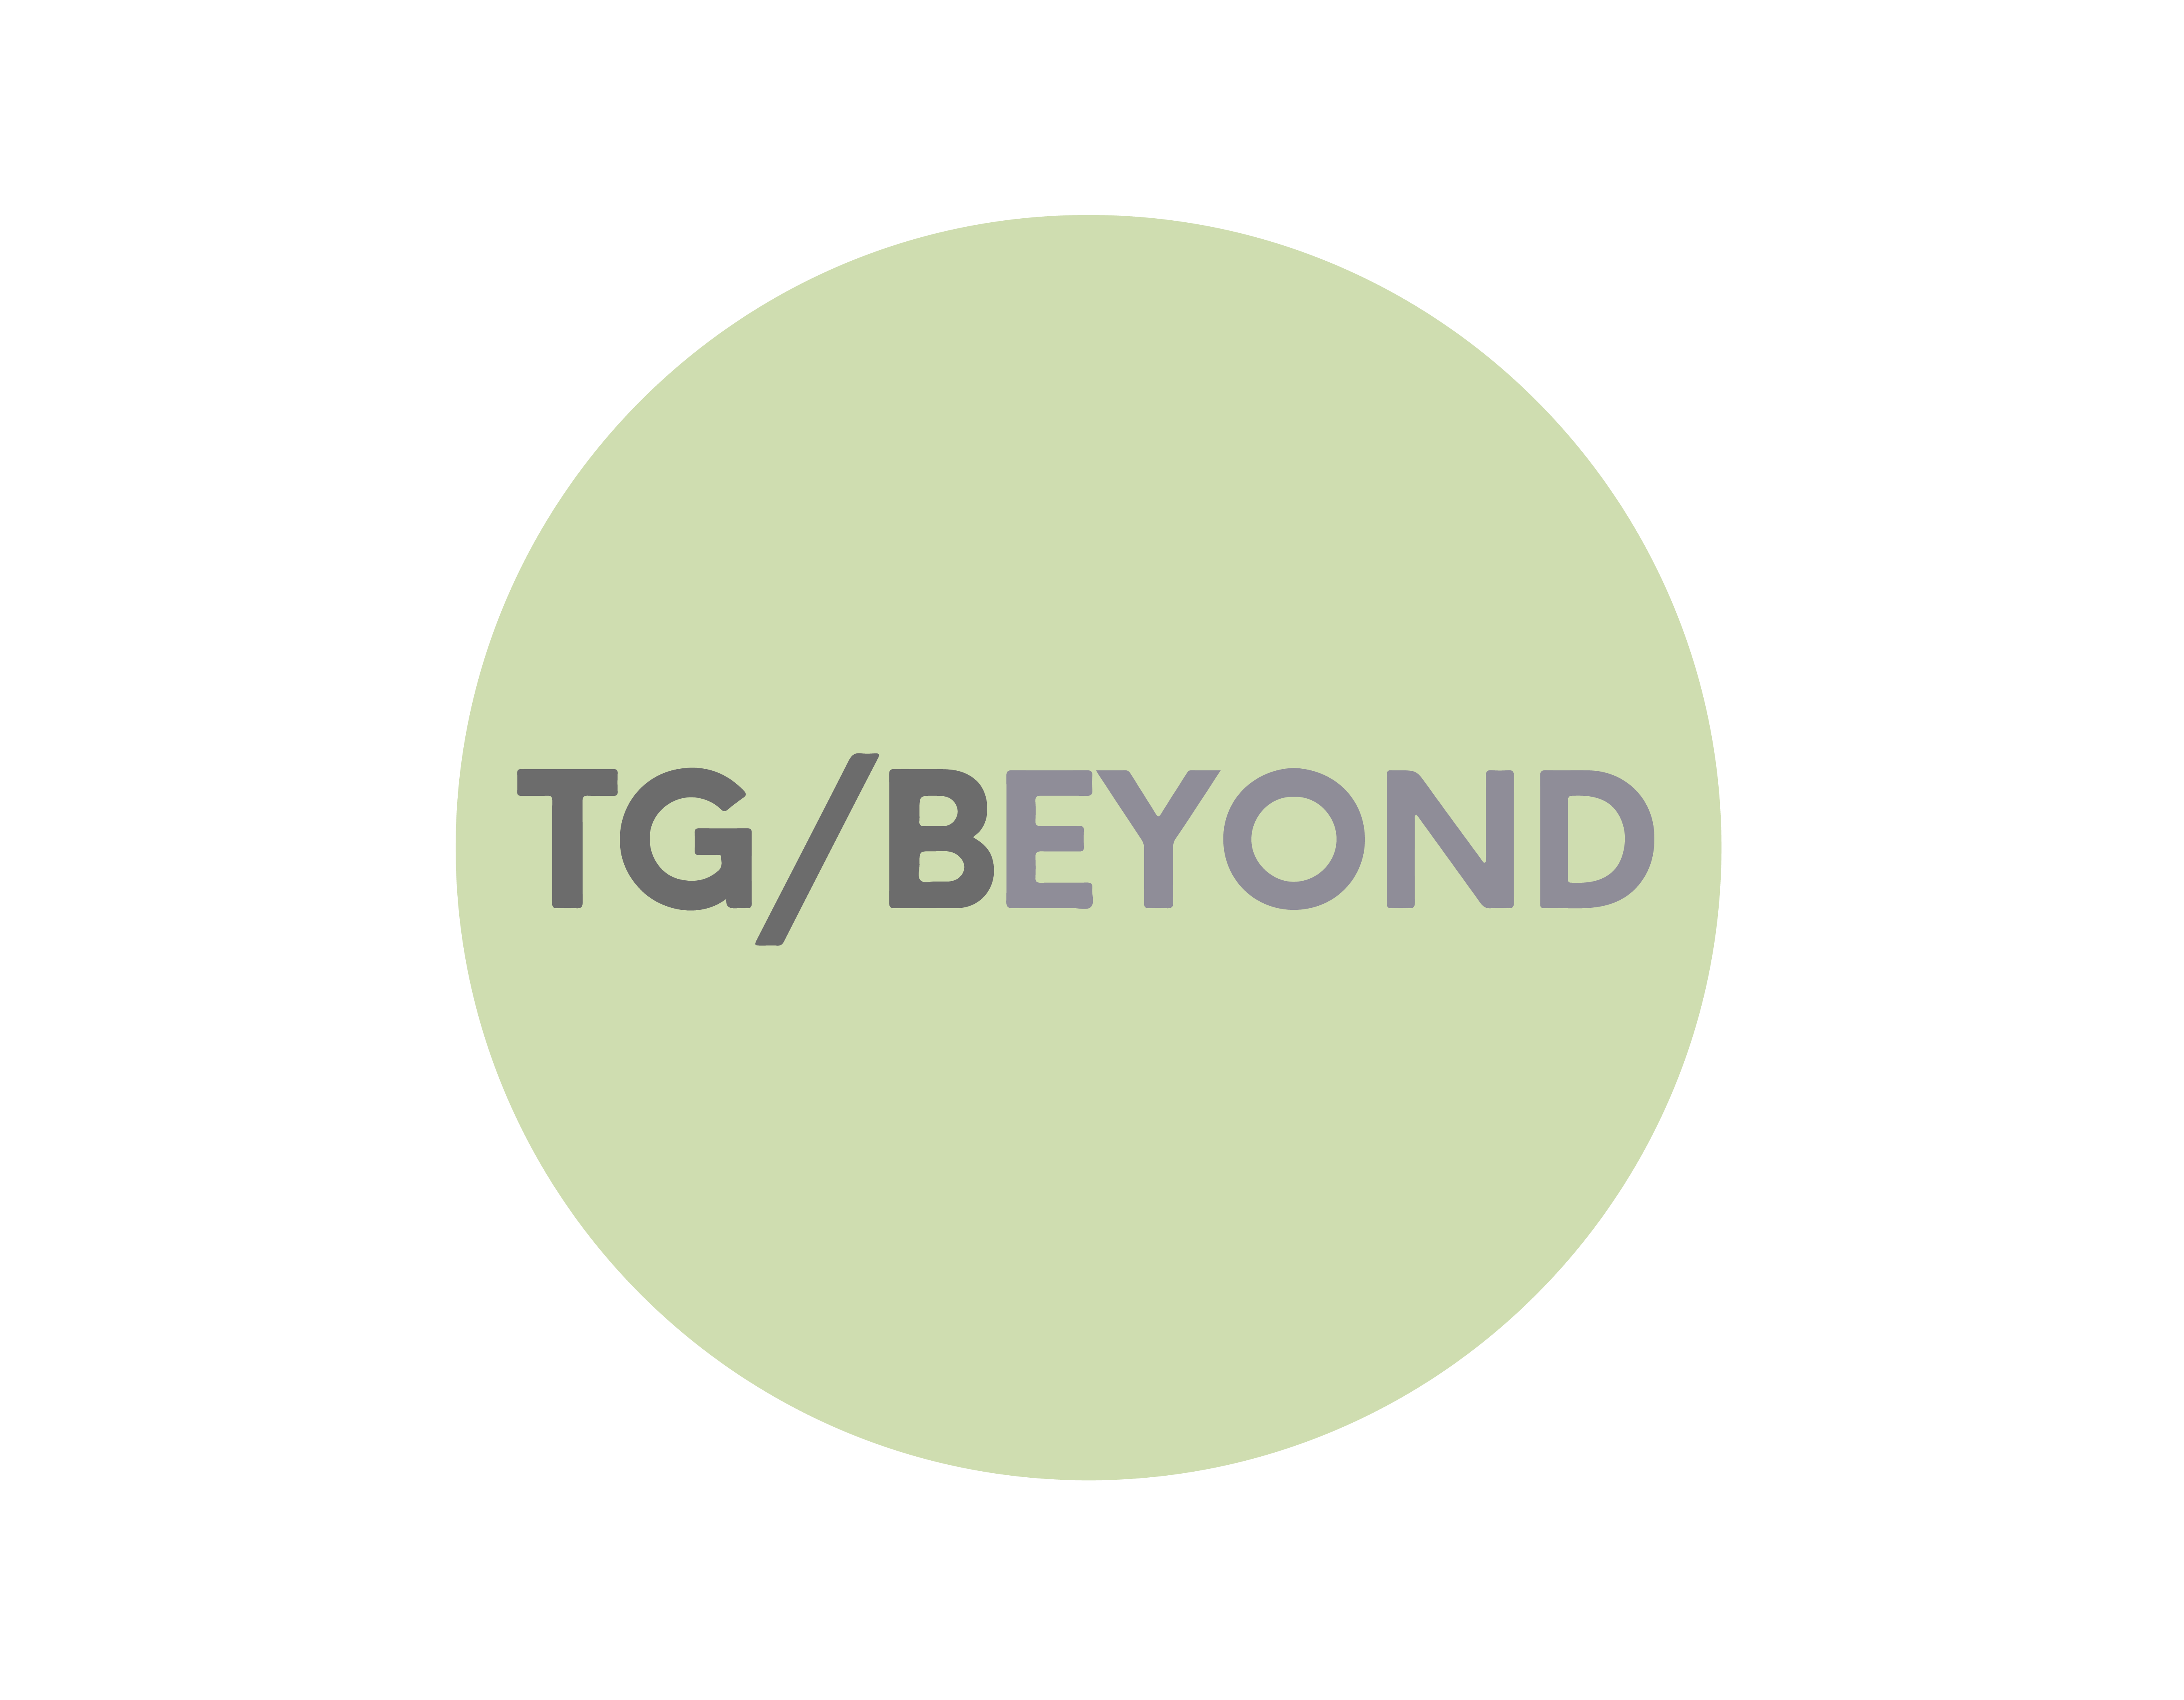 TG/Beyond